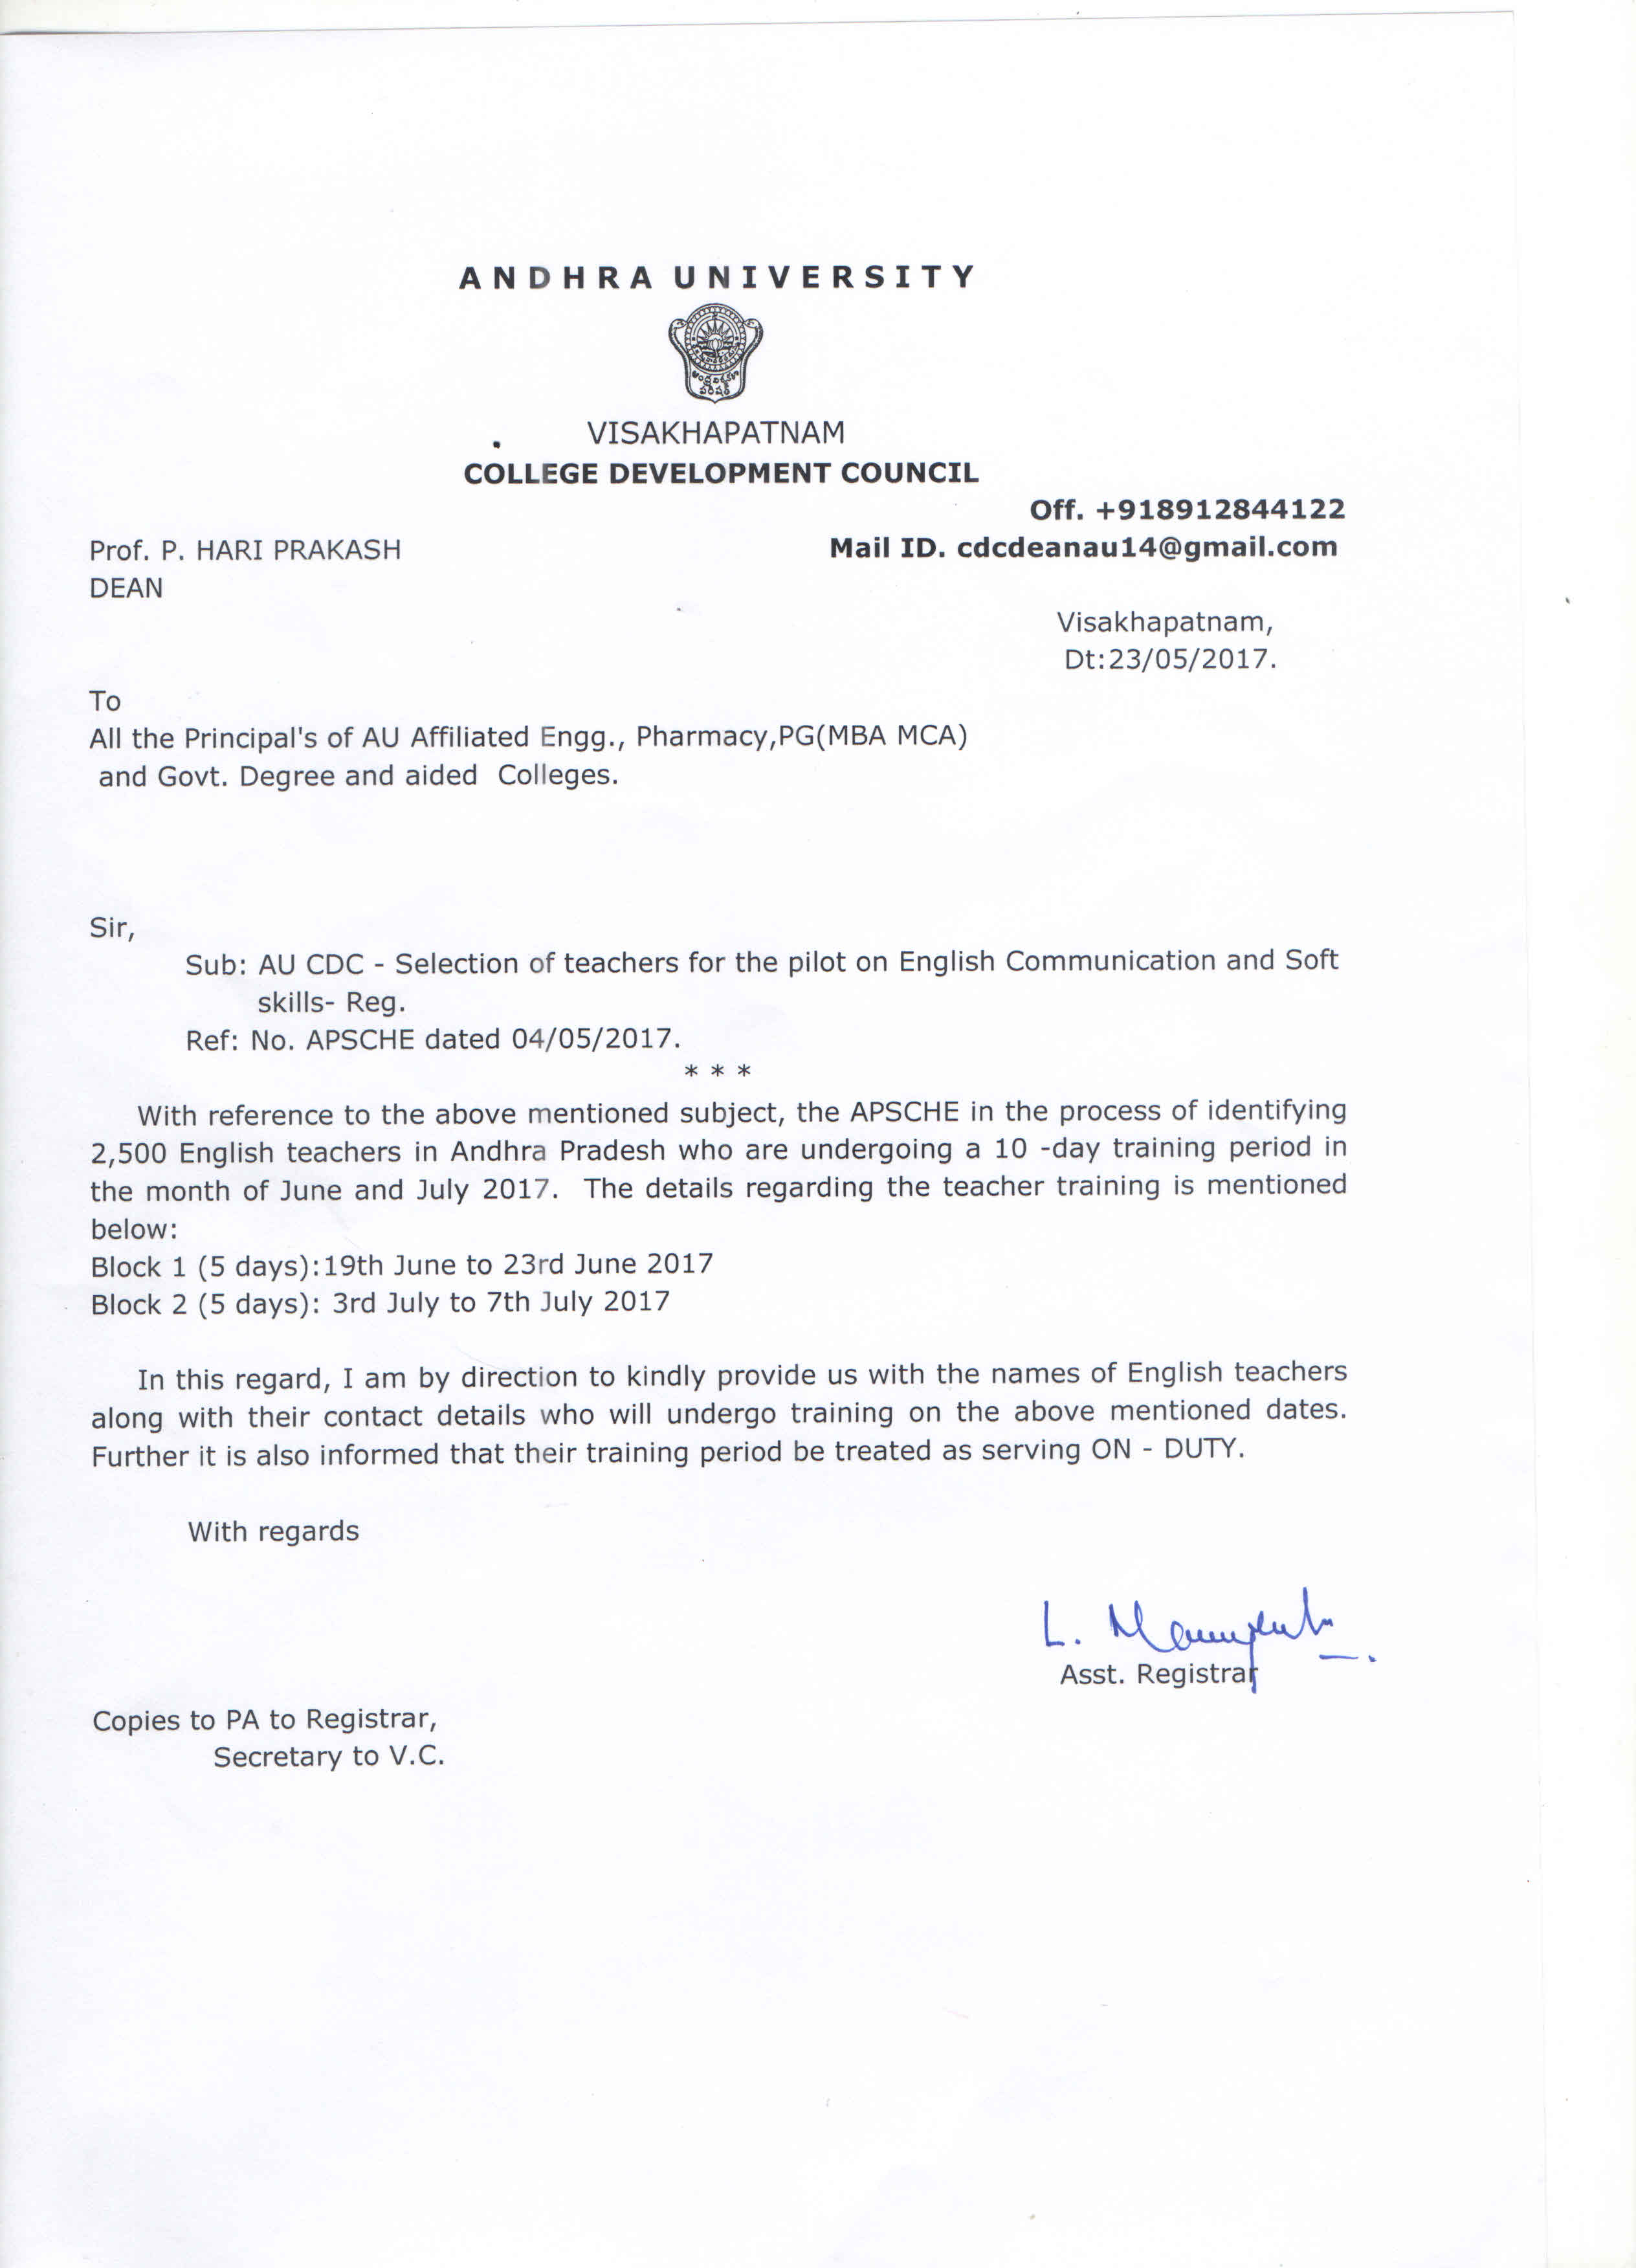 Andhra University | College Development Council (CDC)